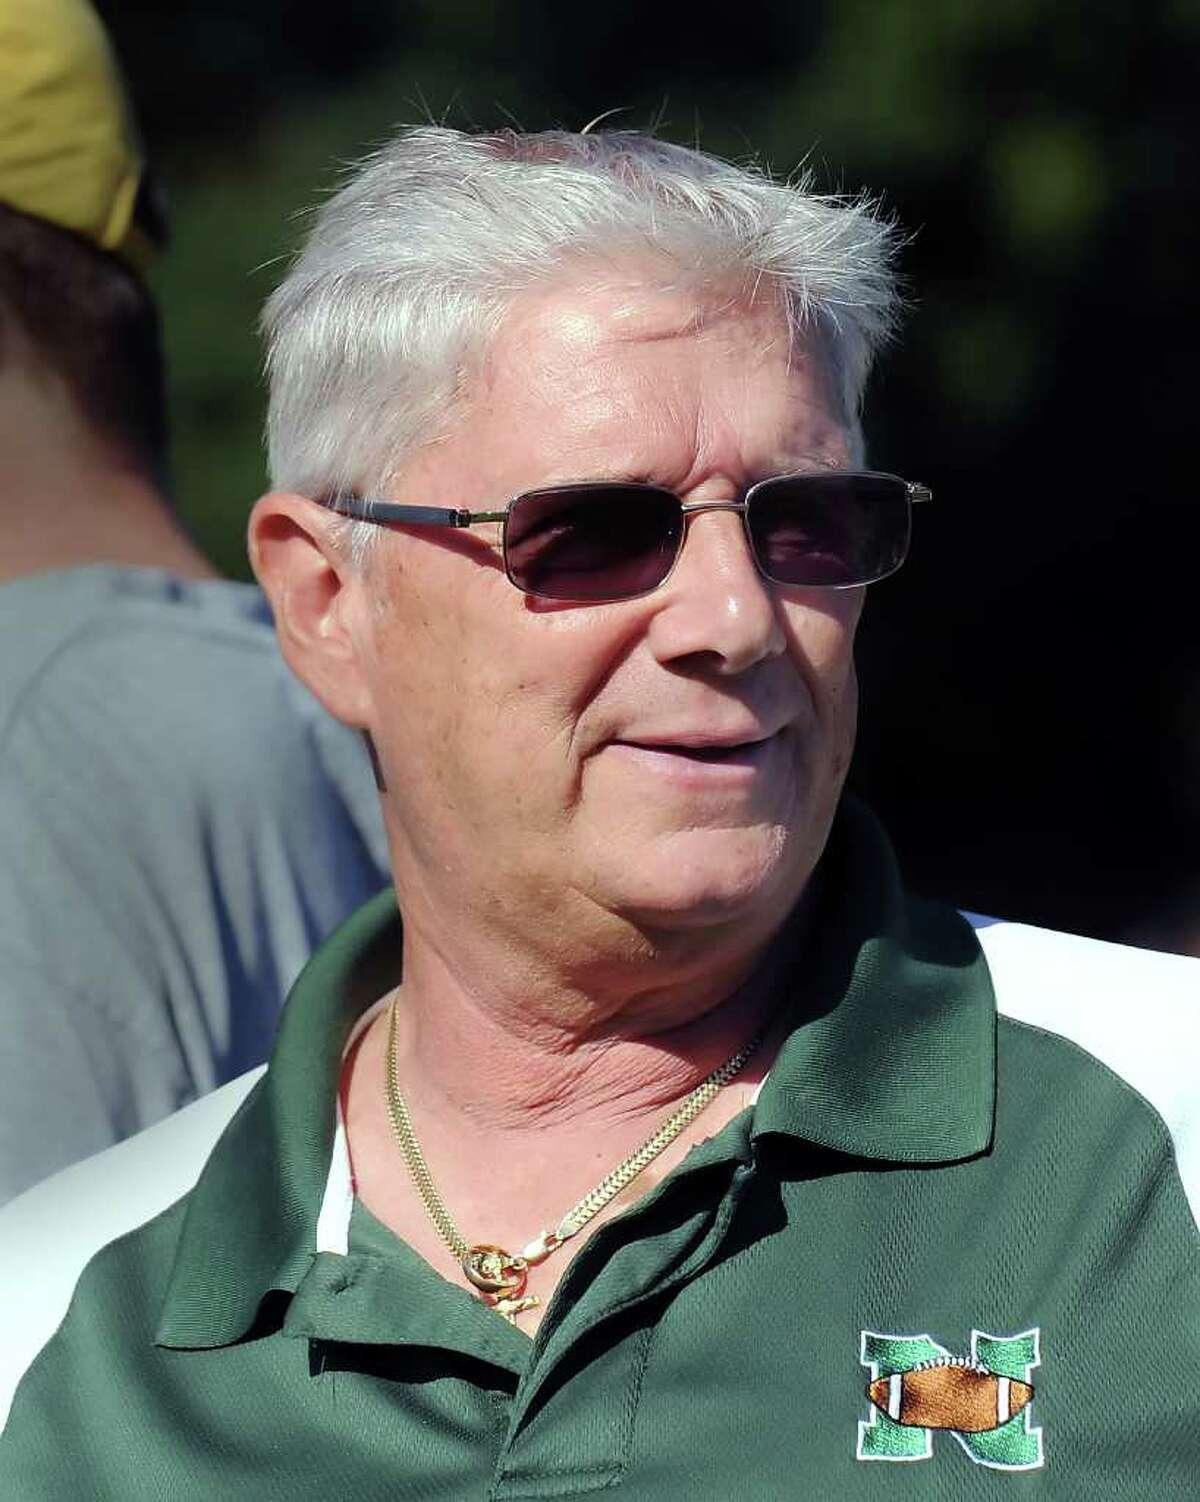 Norwalk High School head football coach, Pete Tucci, during football jamboree at Wilton High School, Saturday morning, Sept. 4, 2010.